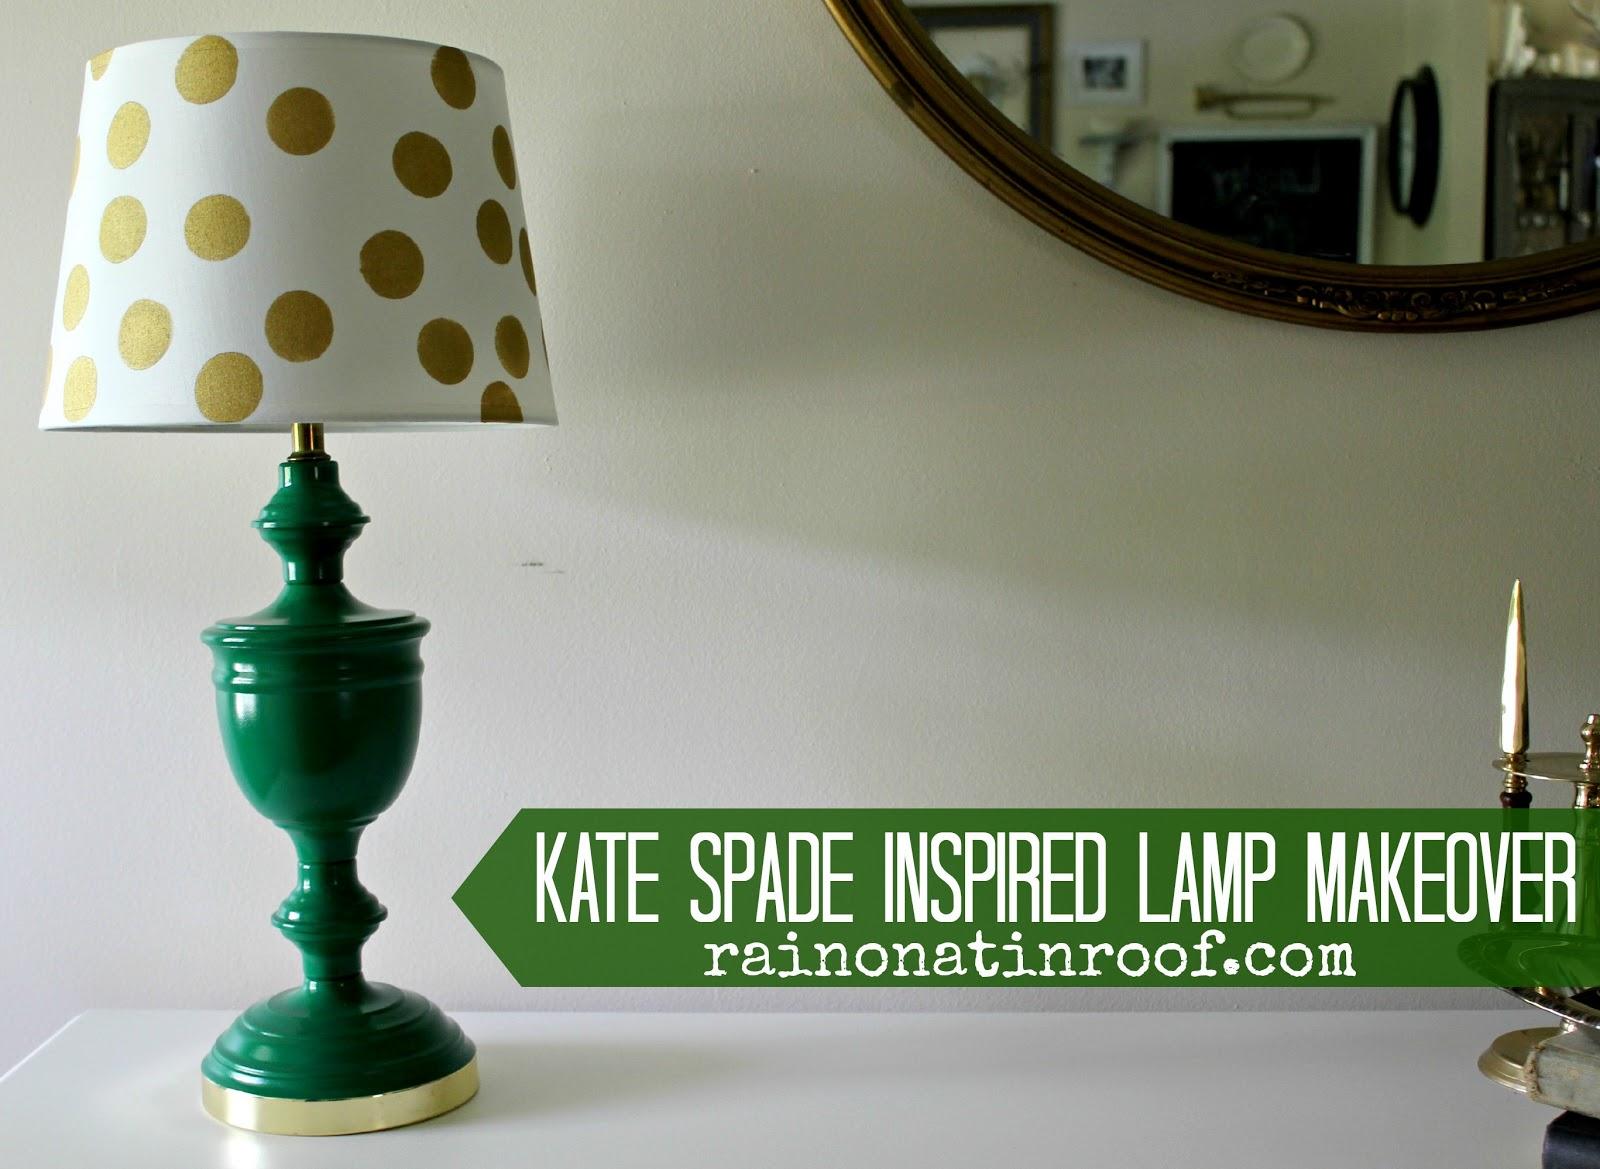 kate spade lamp charlotte street kate spade inspired lamp makeover rainonatinroofcom katespade lamp makeover simple and cheap